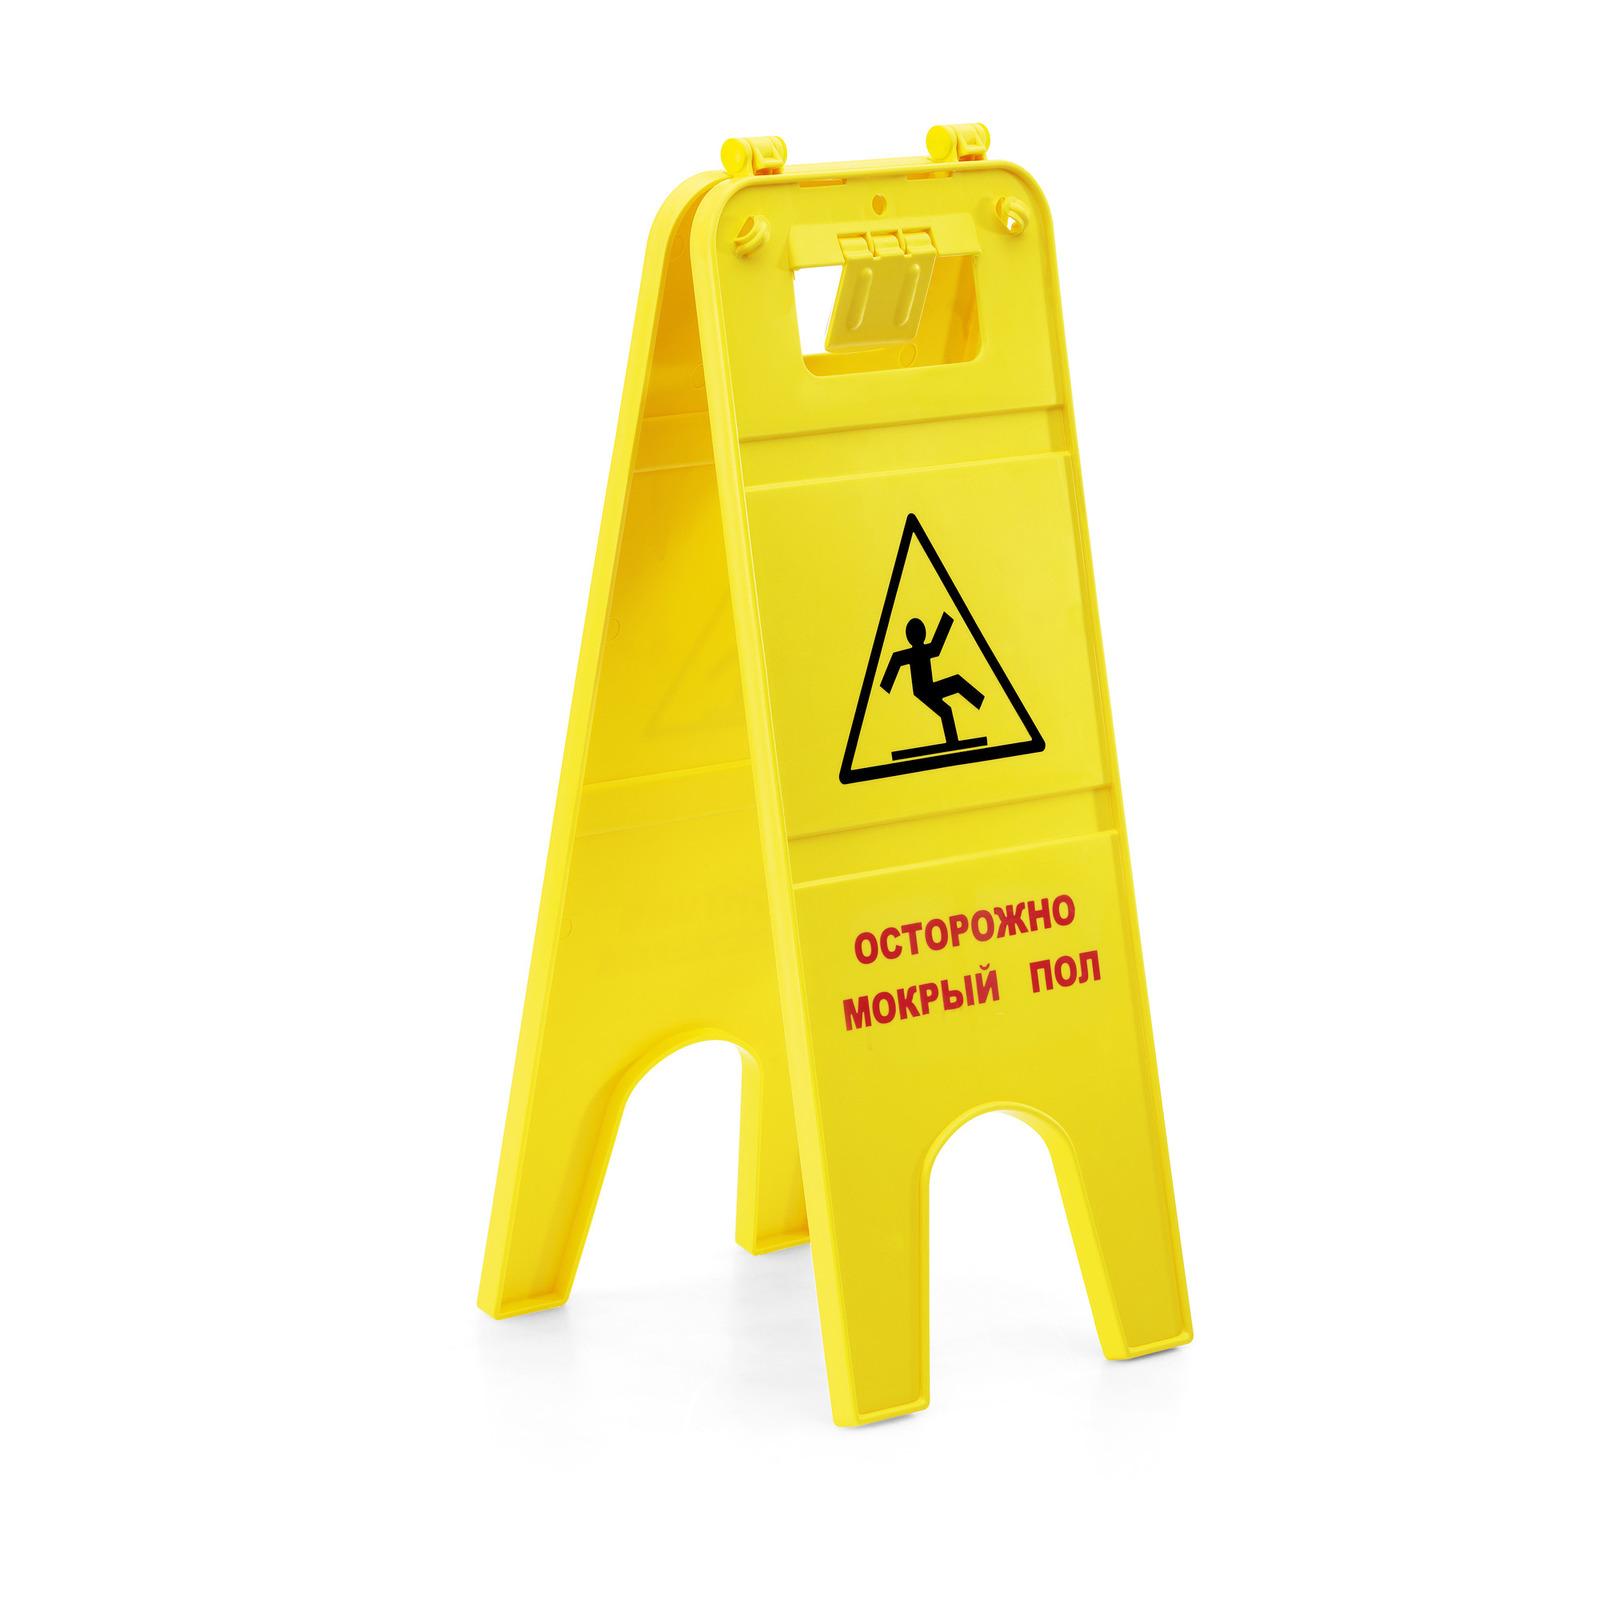 Caution Wet Floor Sign Russian K 228 Rcher International